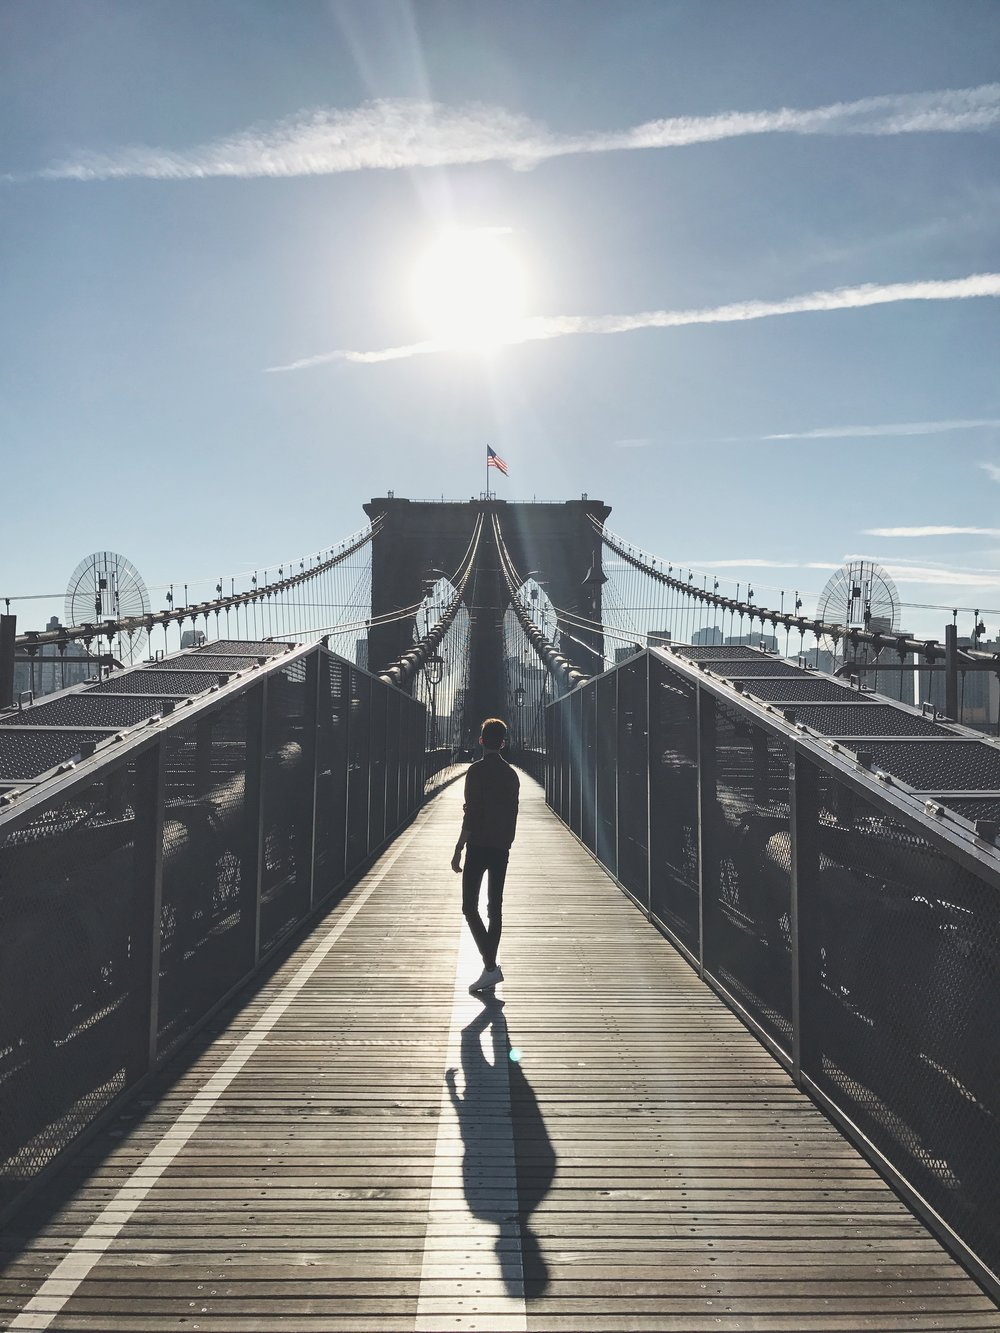 Goodmorning Brooklynn Bridge.